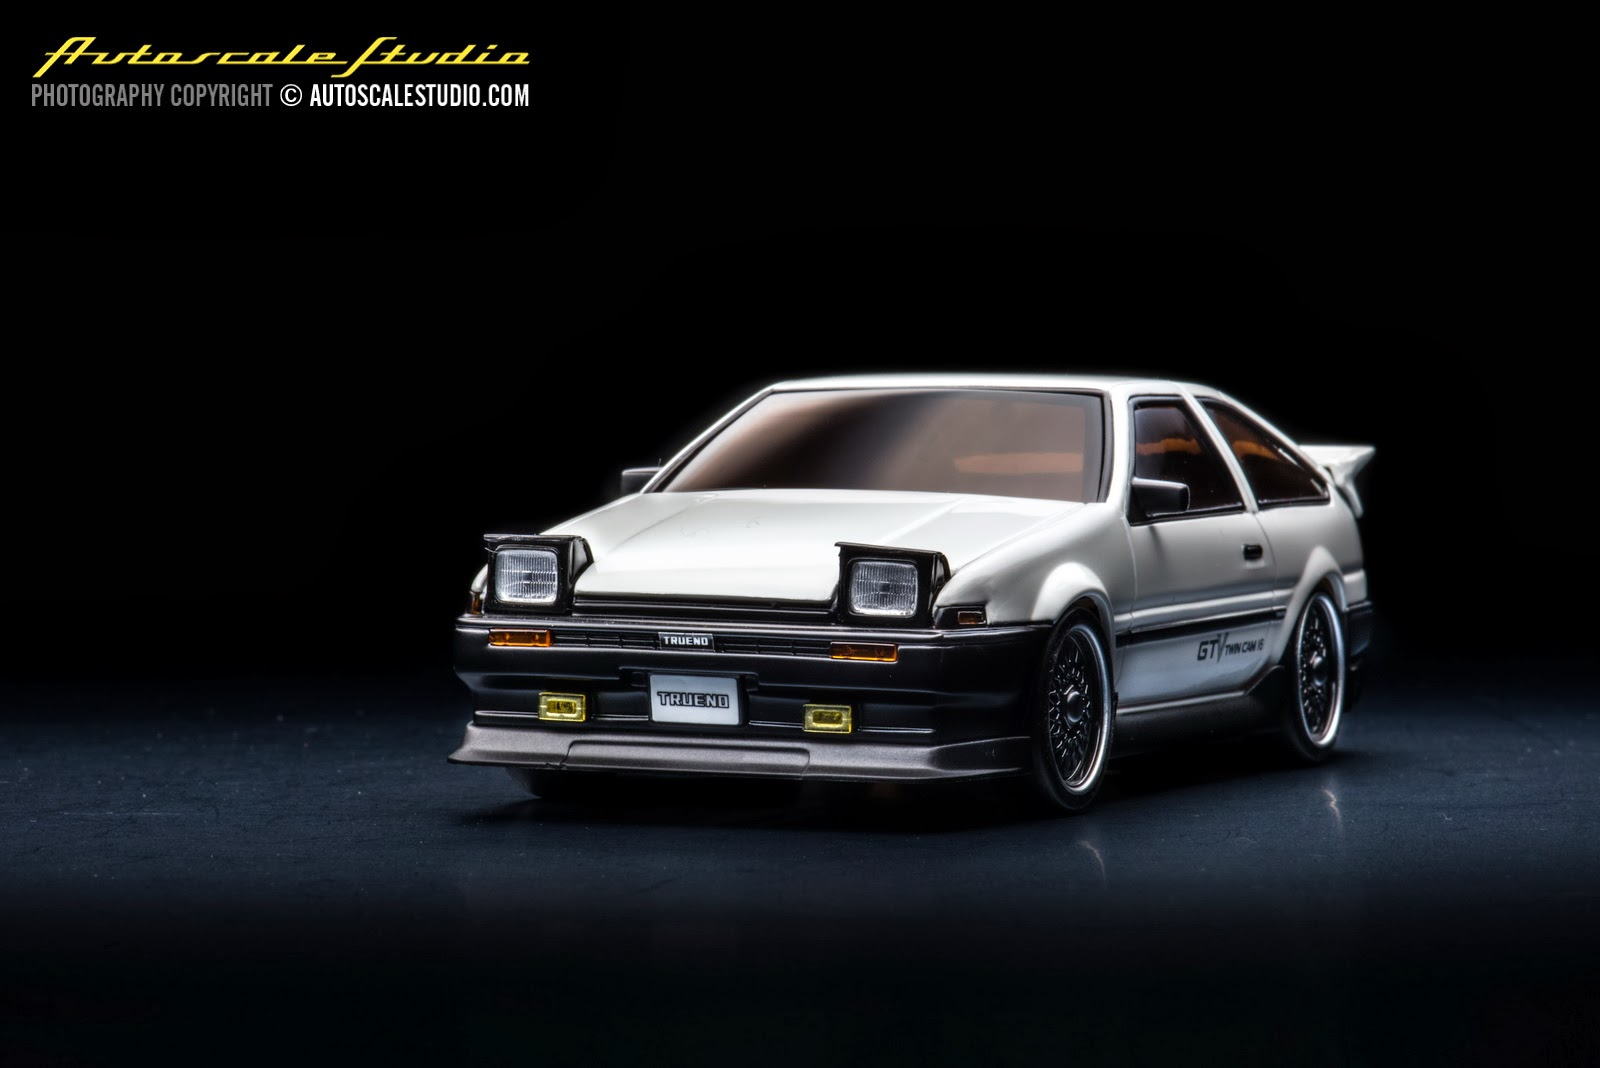 Toyota 86 Livery >> MZP410W Toyota Sprinter Trueno AE86 Aero version white | autoscale studio オートスケール・スタジオ